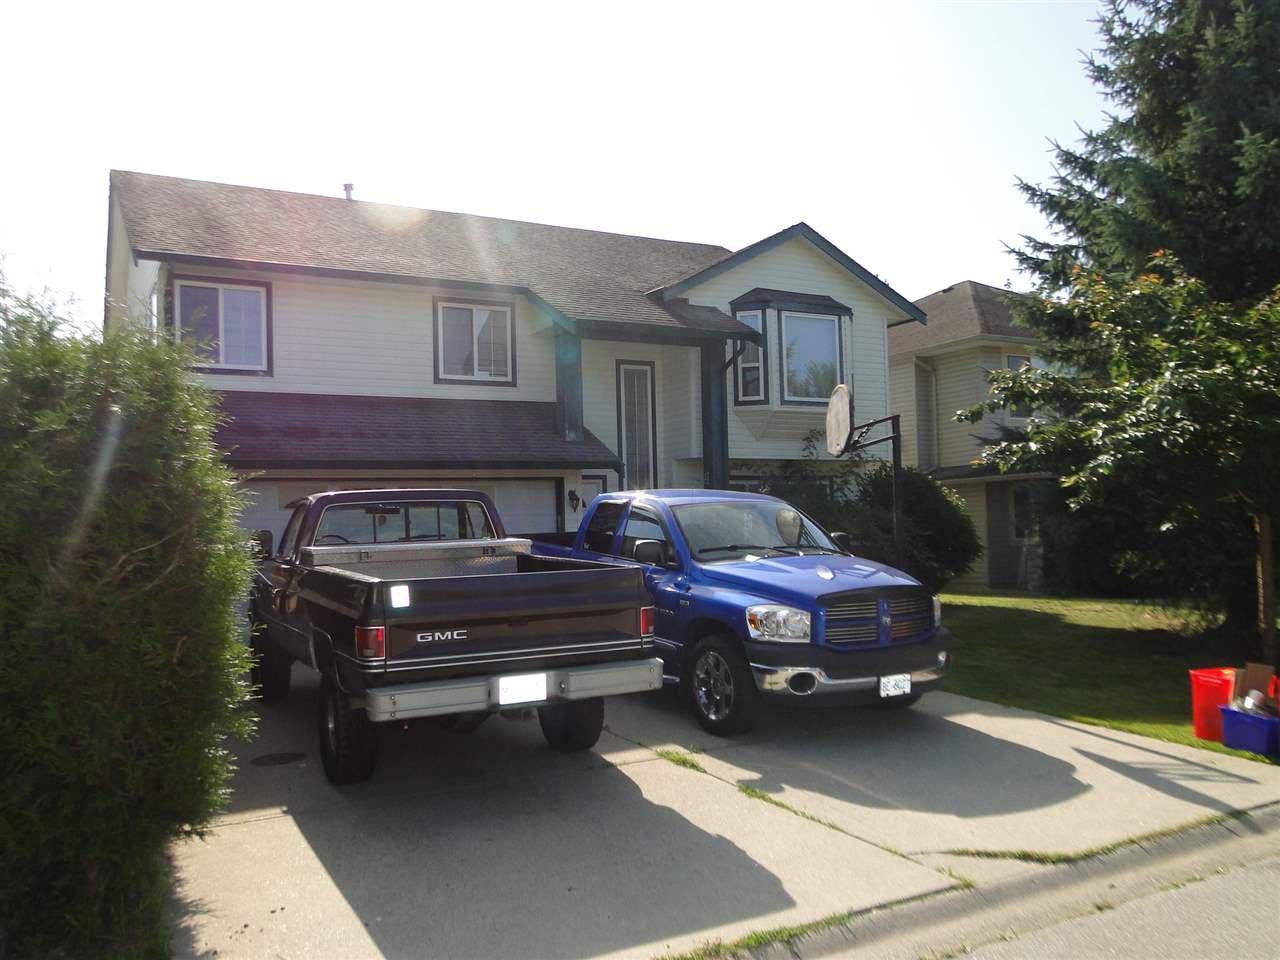 Main Photo: 11422 239 Street in Maple Ridge: Cottonwood MR House for sale : MLS®# R2392095